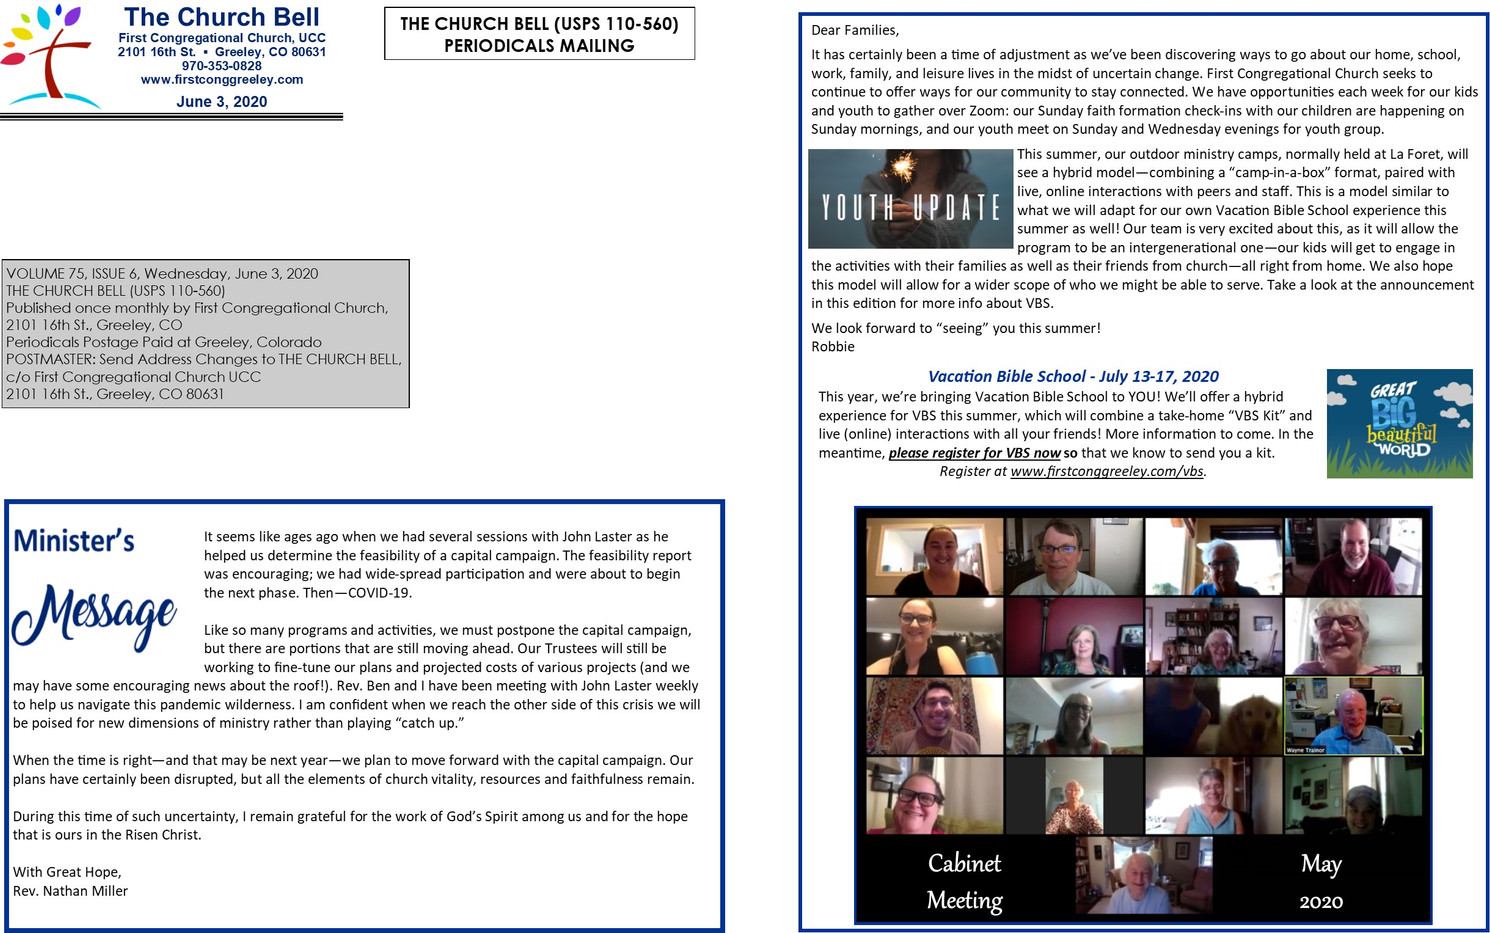 June 2020 Bell page 1.jpg